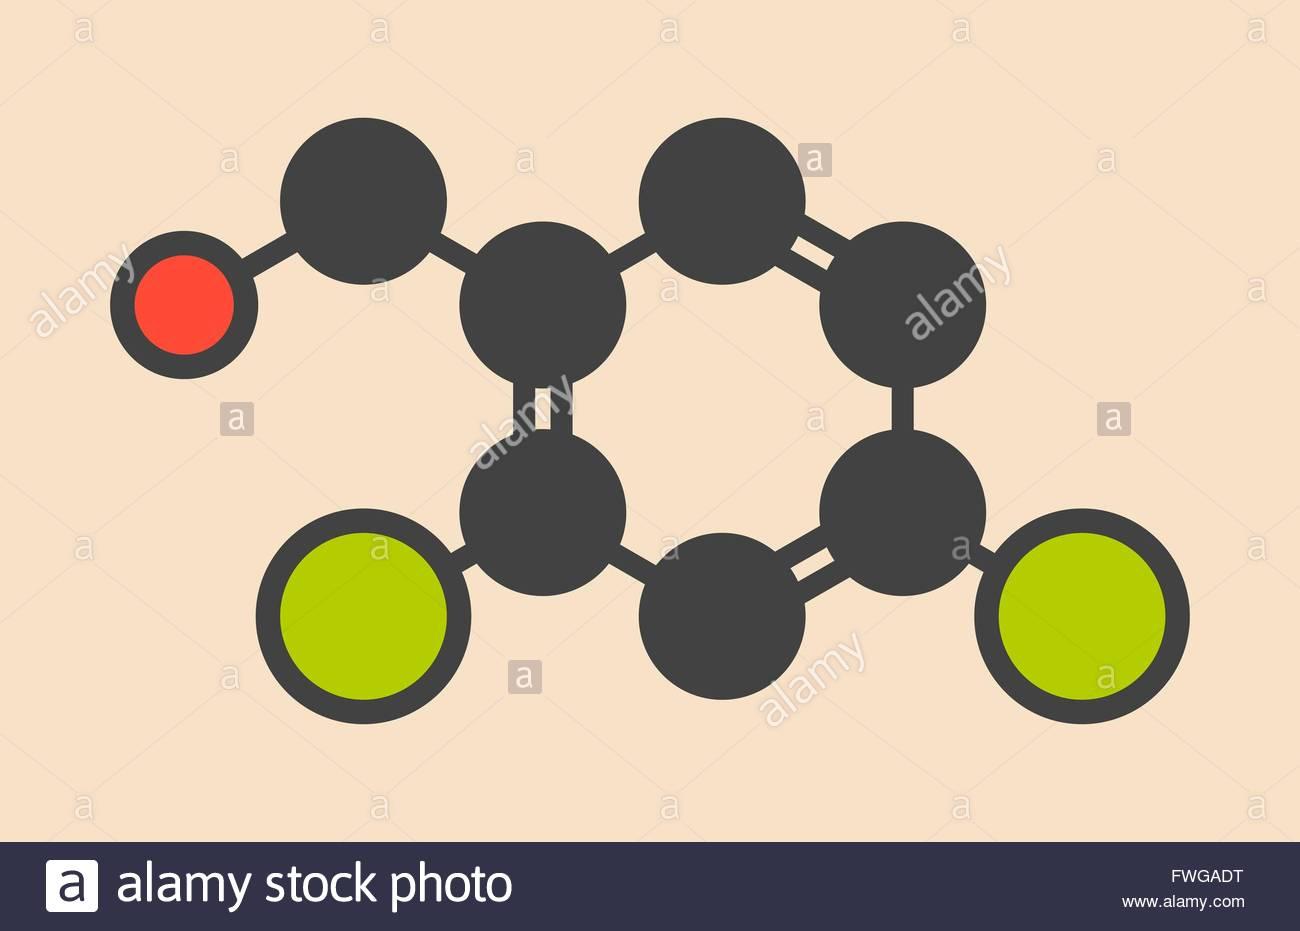 Antiseptic Molecule Stock Photos & Antiseptic Molecule Stock.